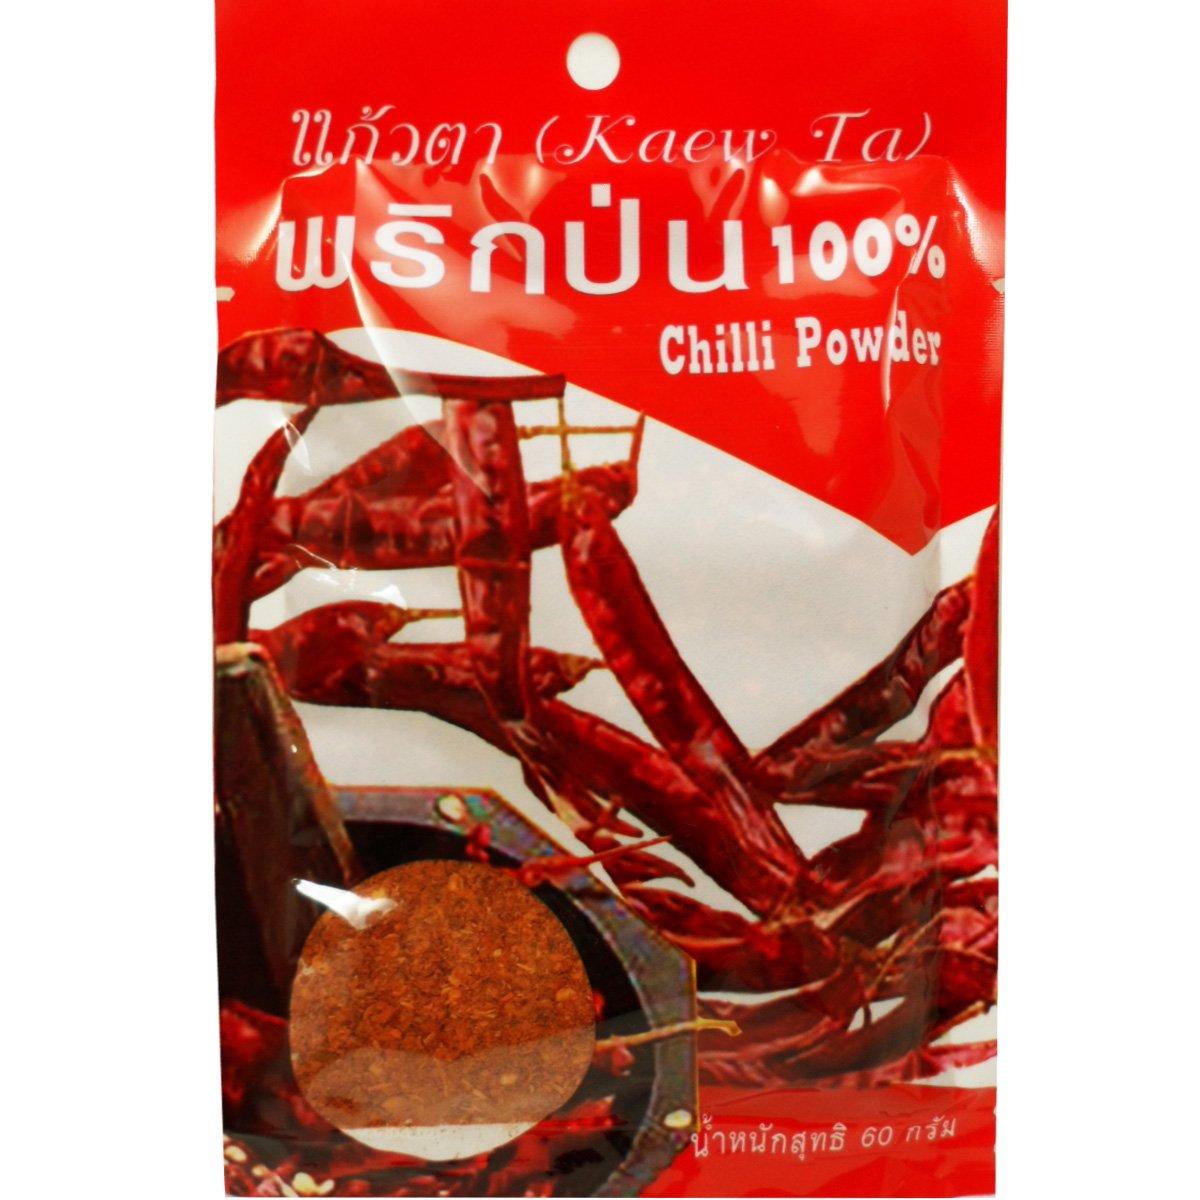 Dried Chilli Powder (Prik Pon) 100% Natural Very Spicy Thai Style Net Wt 60 G (2.11 Oz) Kaew-ta Brand X 2 Bags